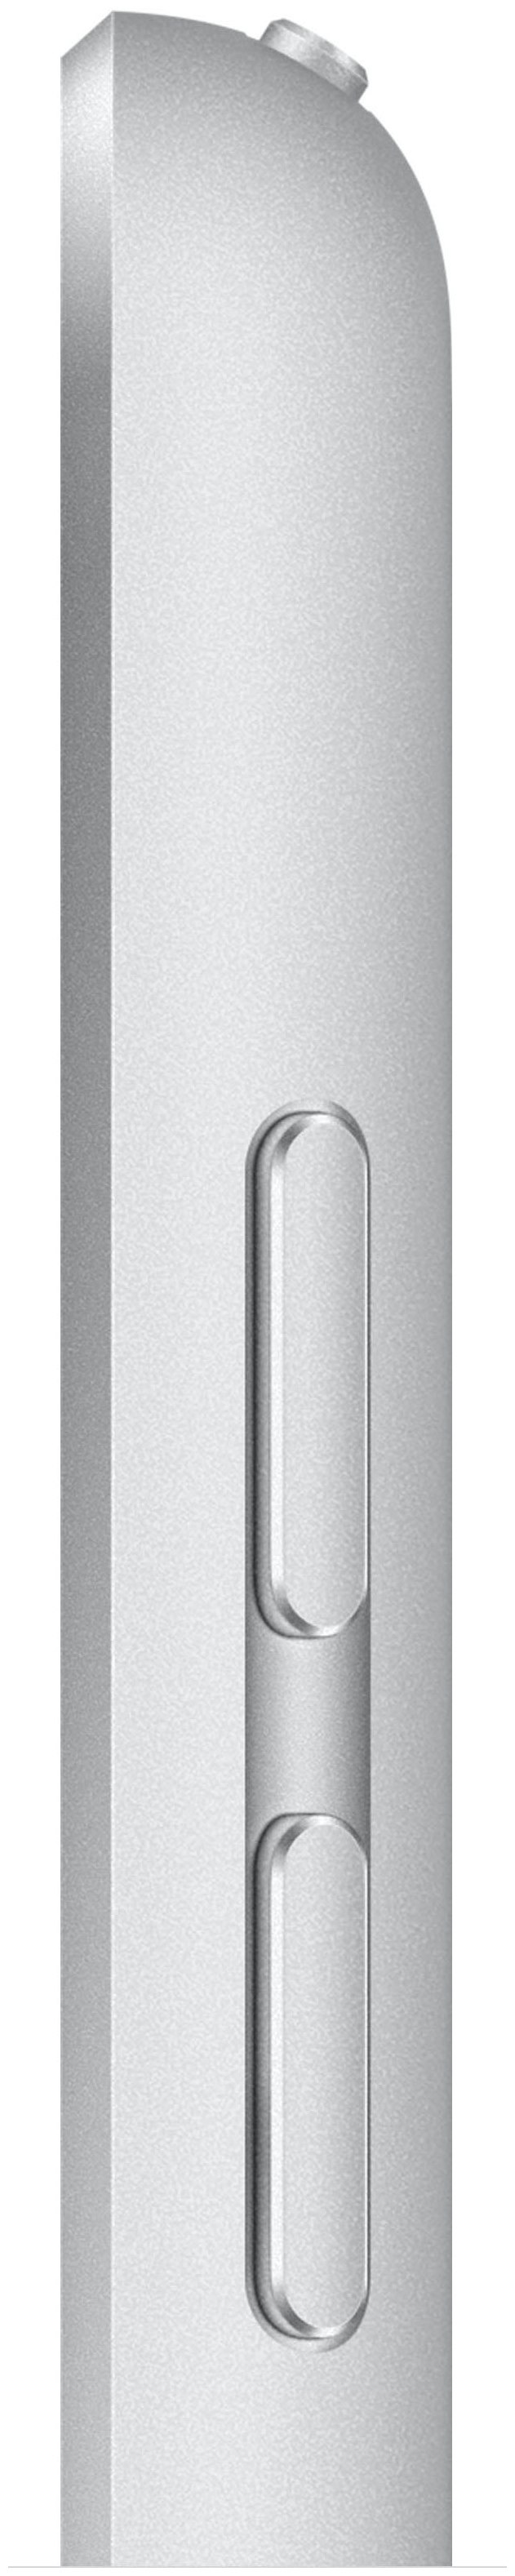 Apple iPad (2020) 128Gb Wi-Fi - проводные интерфейсы: Apple Lightning, mini jack 3.5mm